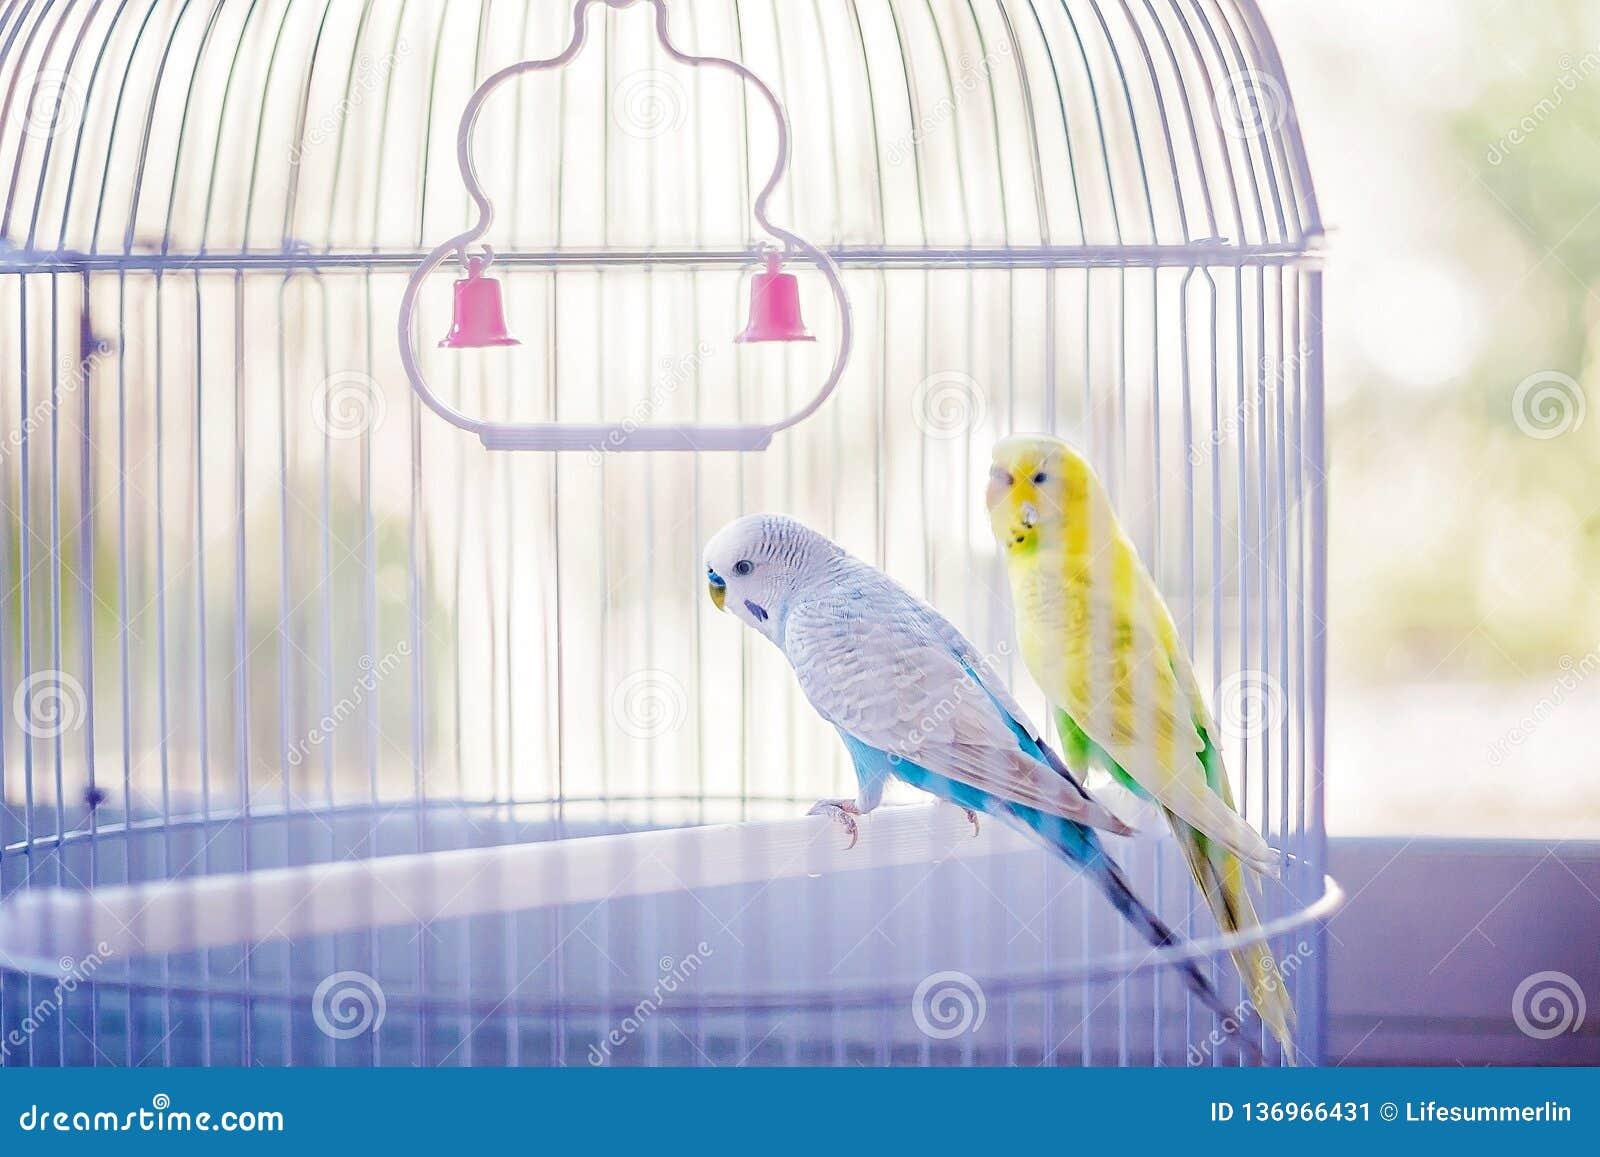 Pappagalli gialli e blu